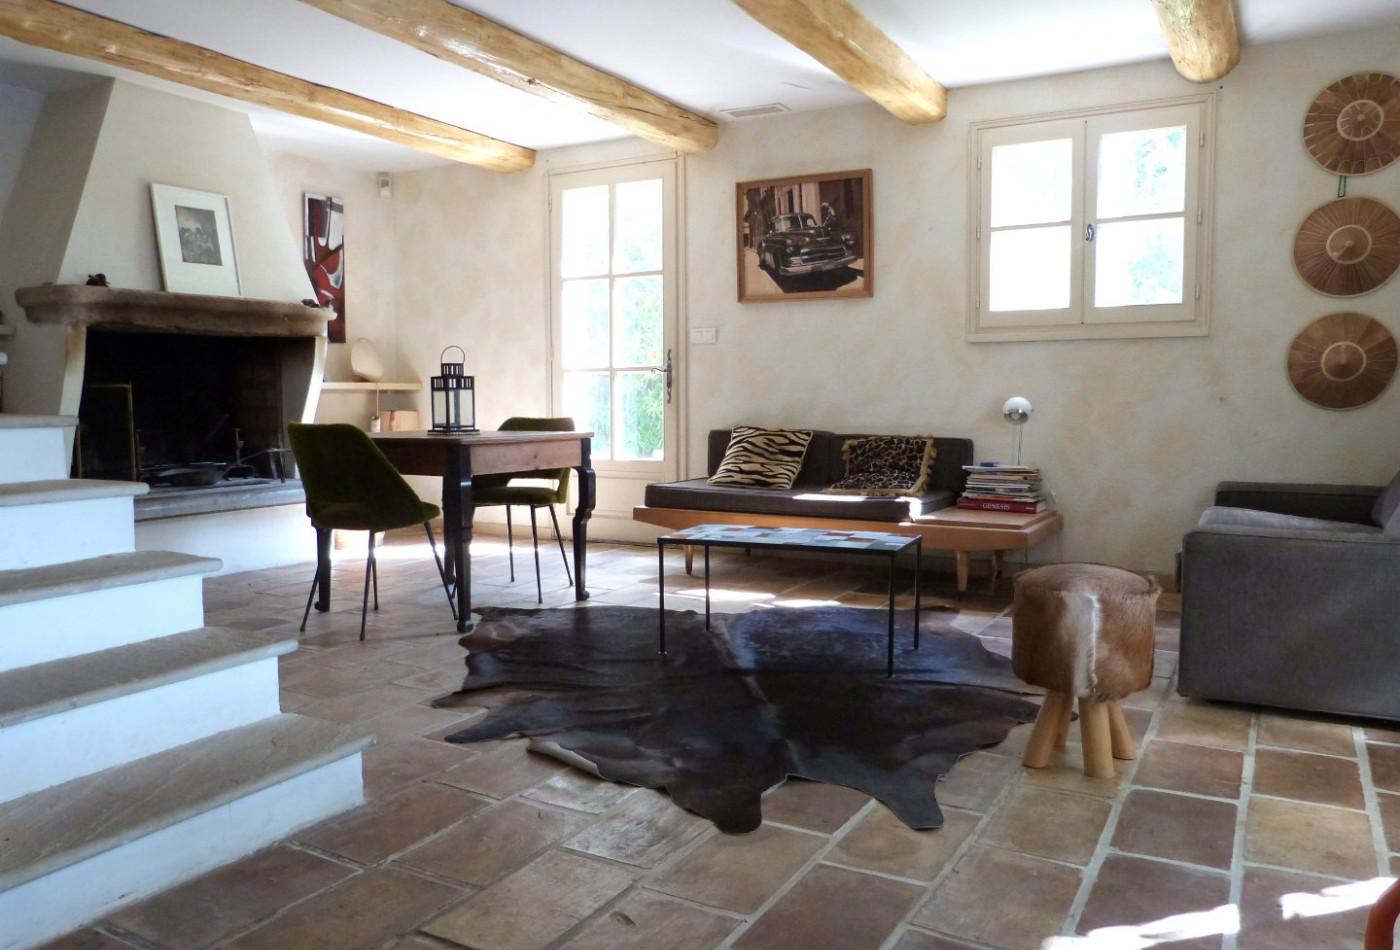 A vendre  Montpellier | Réf 340138429 - Agence galerie casanova